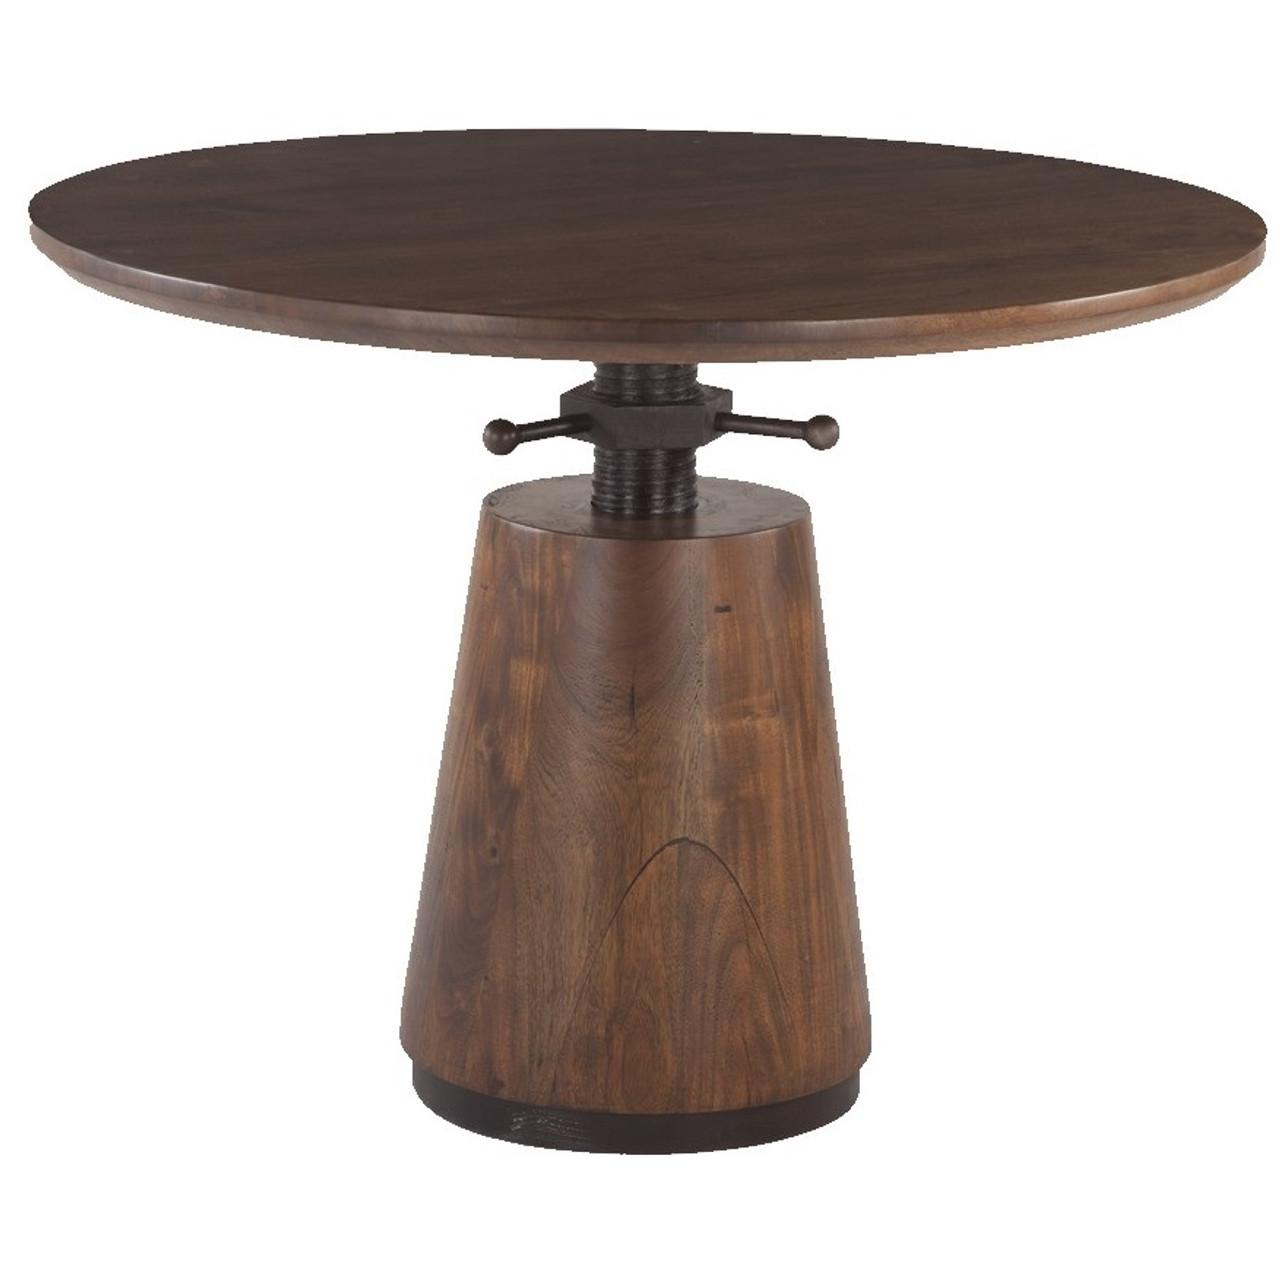 Industrial solid wood adjustable pub table 40 zin home industrial solid wood adjustable pub table 40 watchthetrailerfo